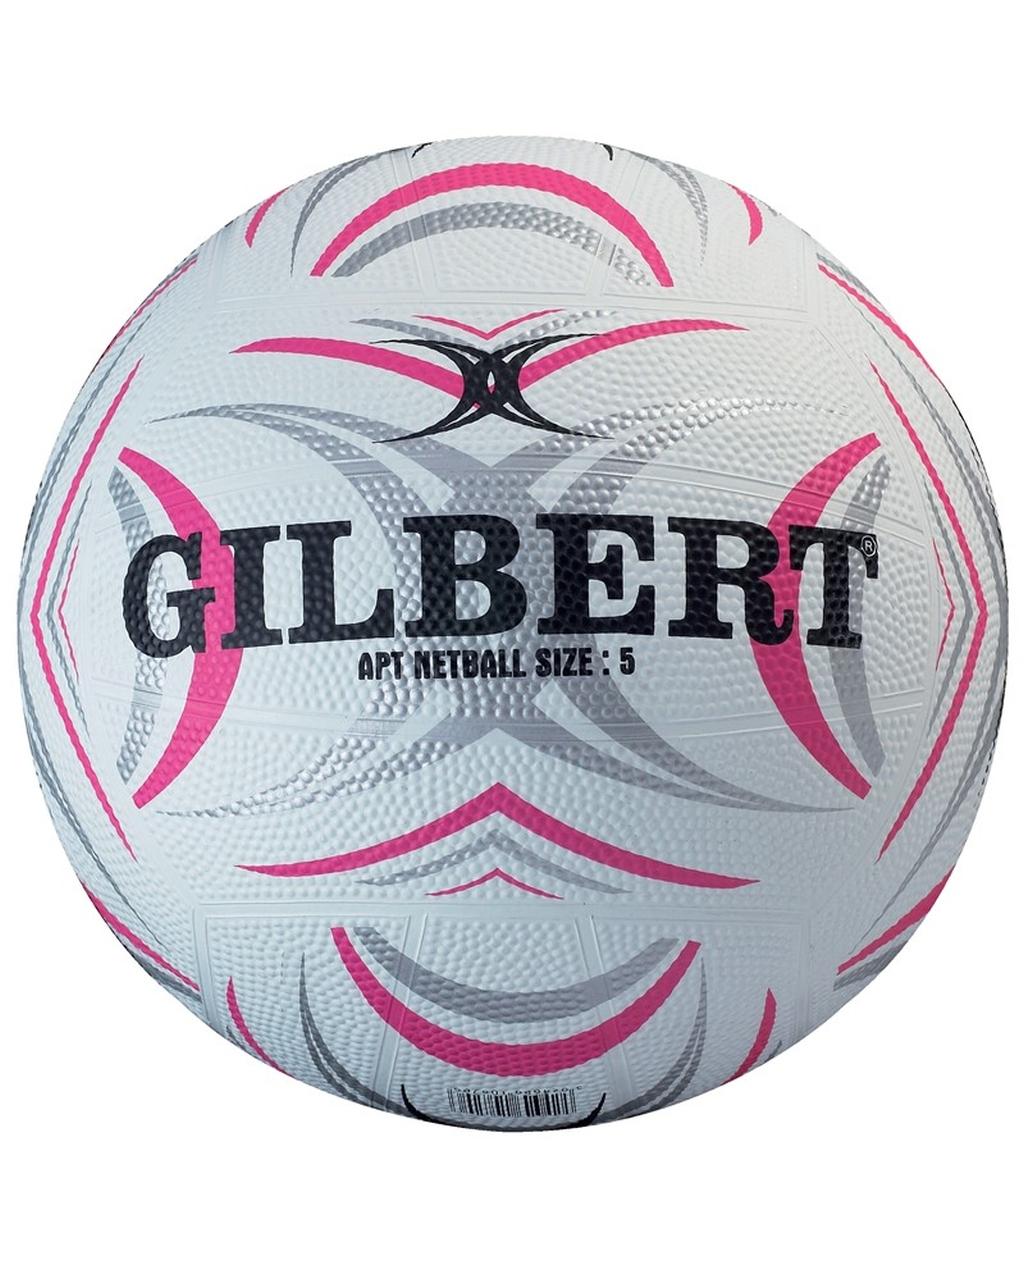 Netball Gilbert ATP S4